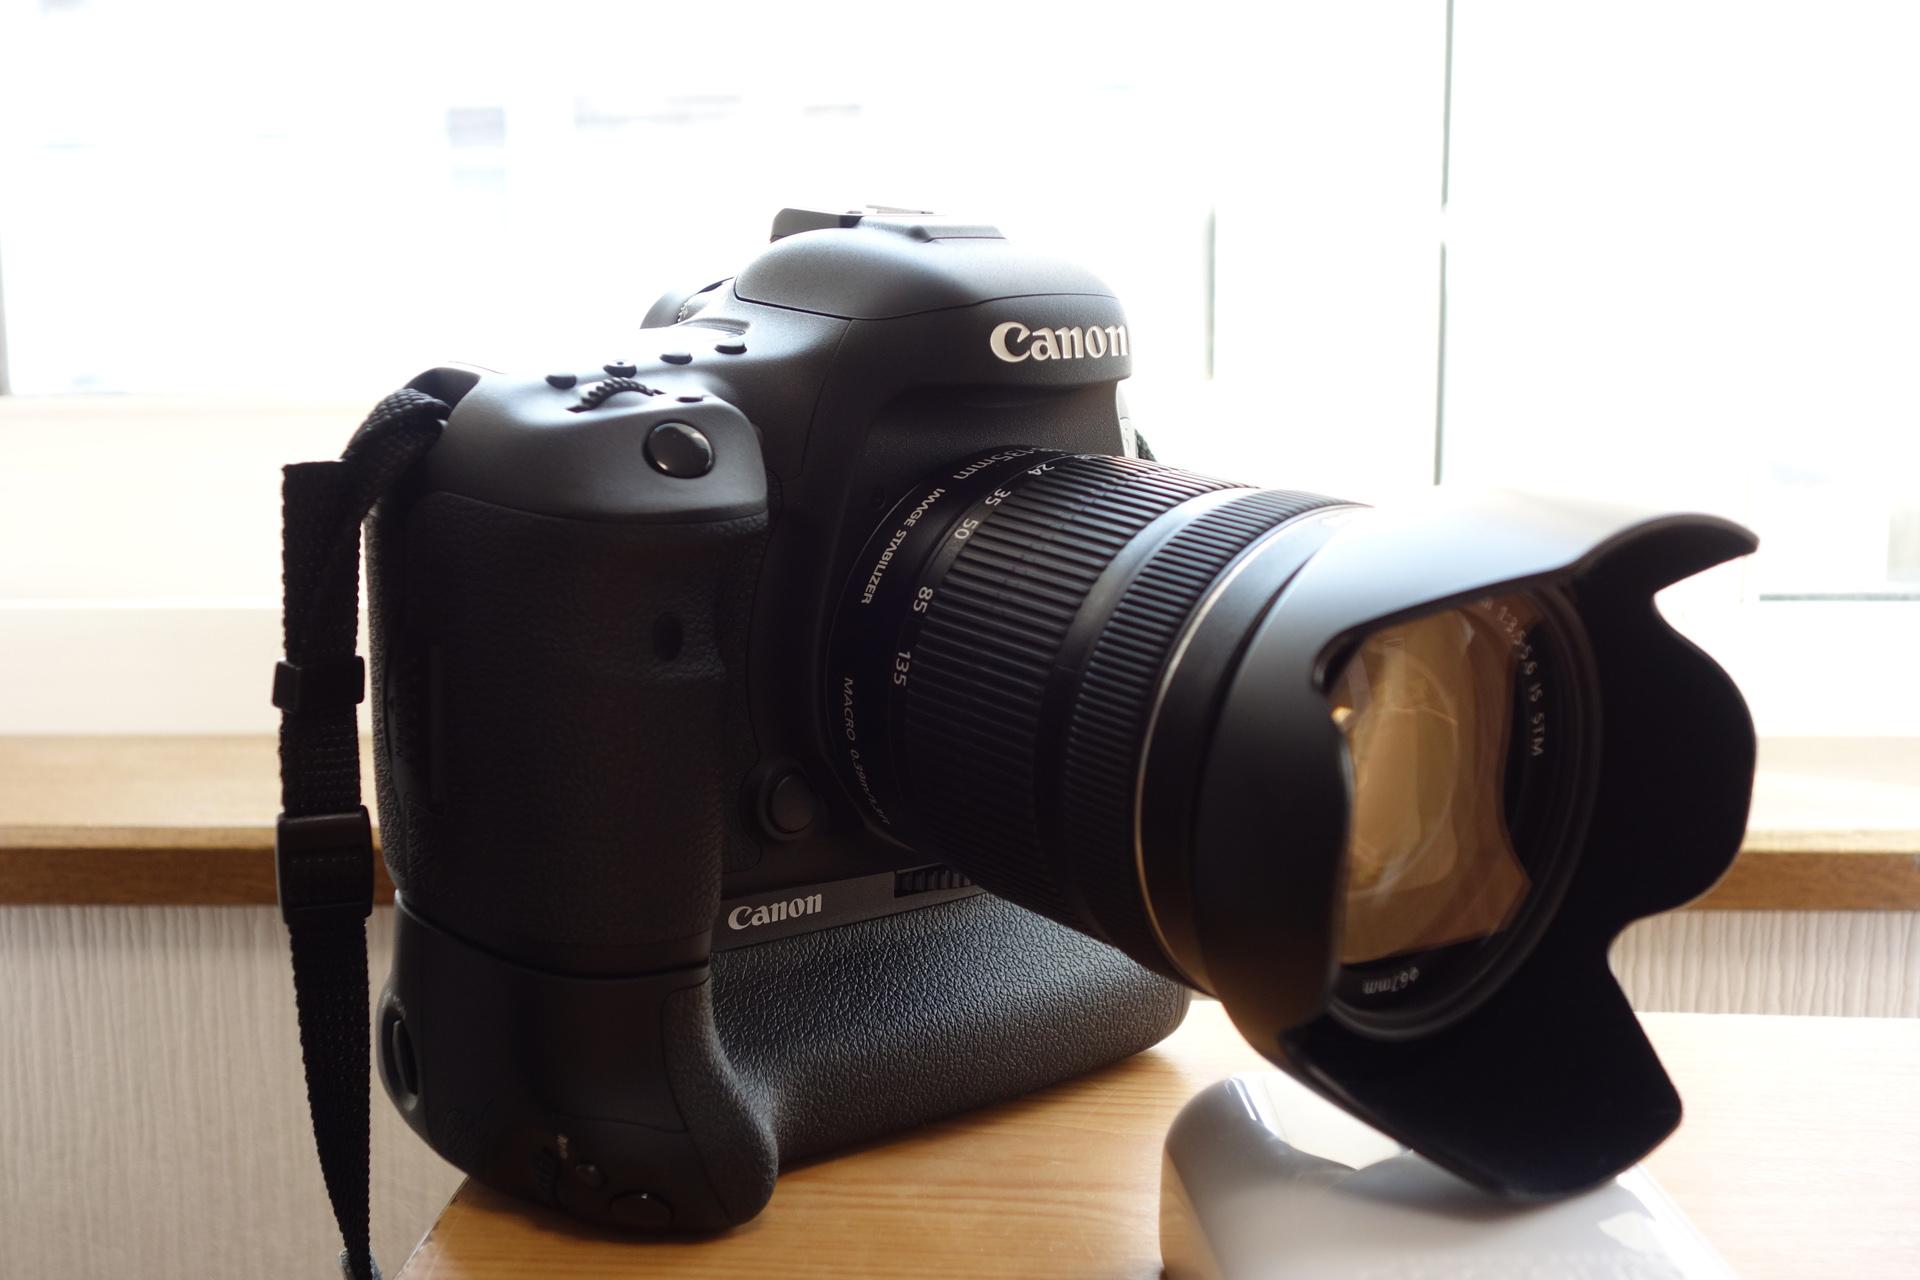 http://sokuup.net/imgs/soku_32476.jpg :: カメラ機材 カメラ ... : cc l 換算 : すべての講義